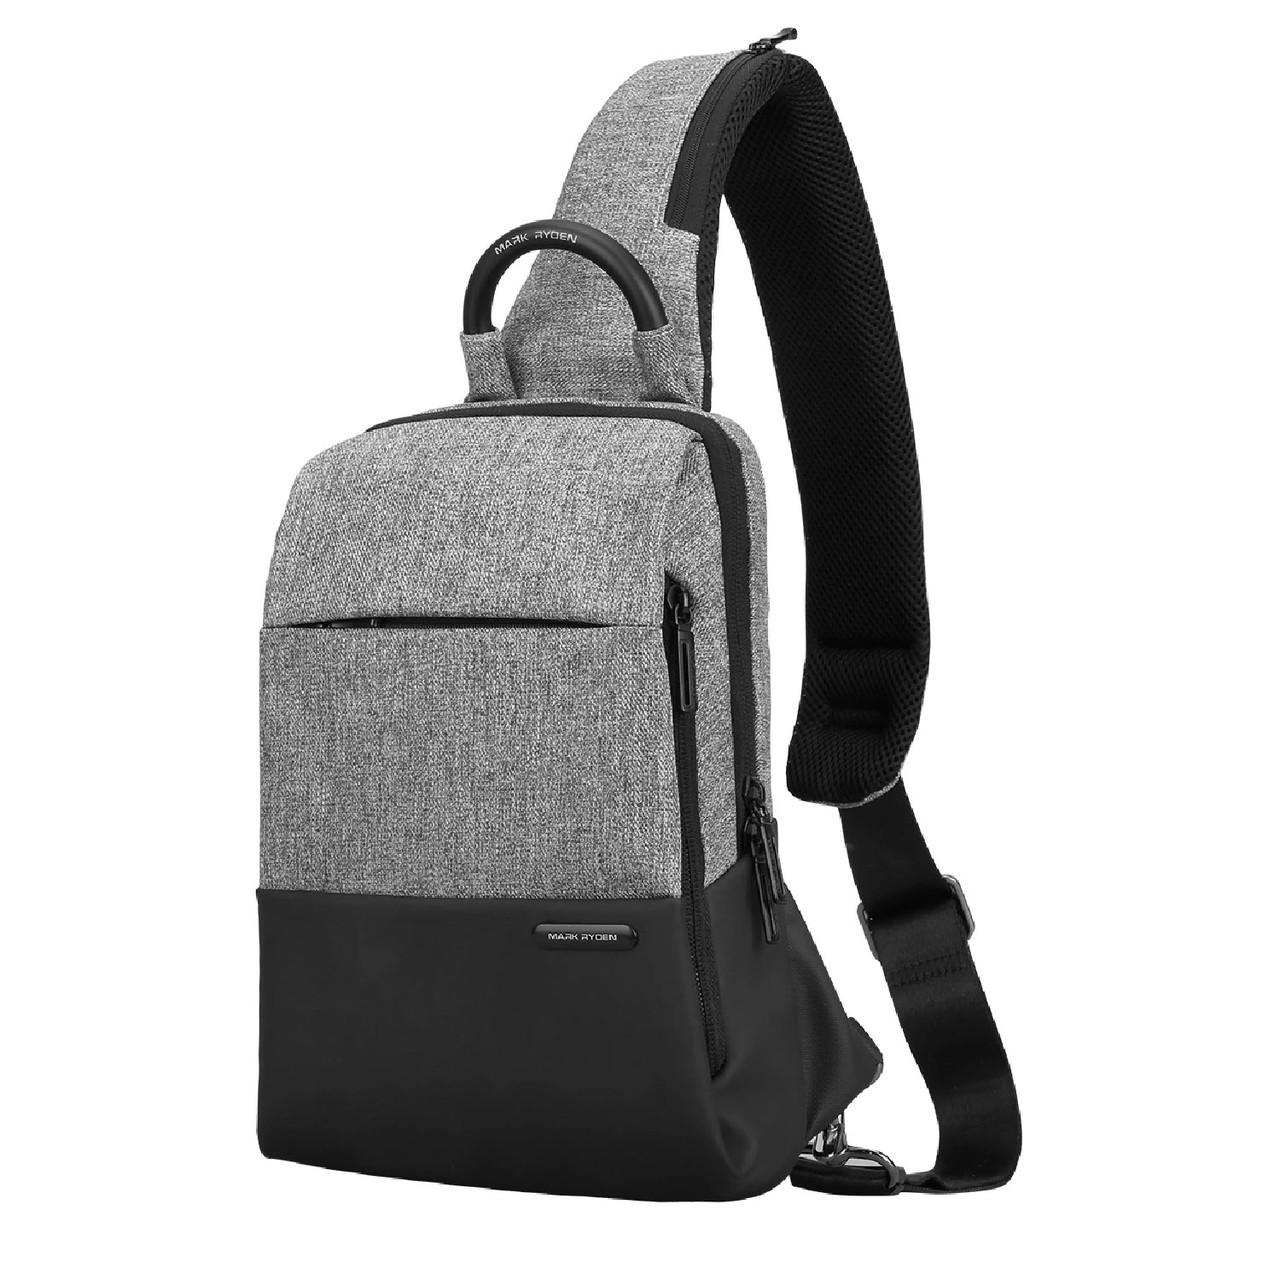 Рюкзак с одной лямкой Mark Ryden Mini Lux MR7558 Gray